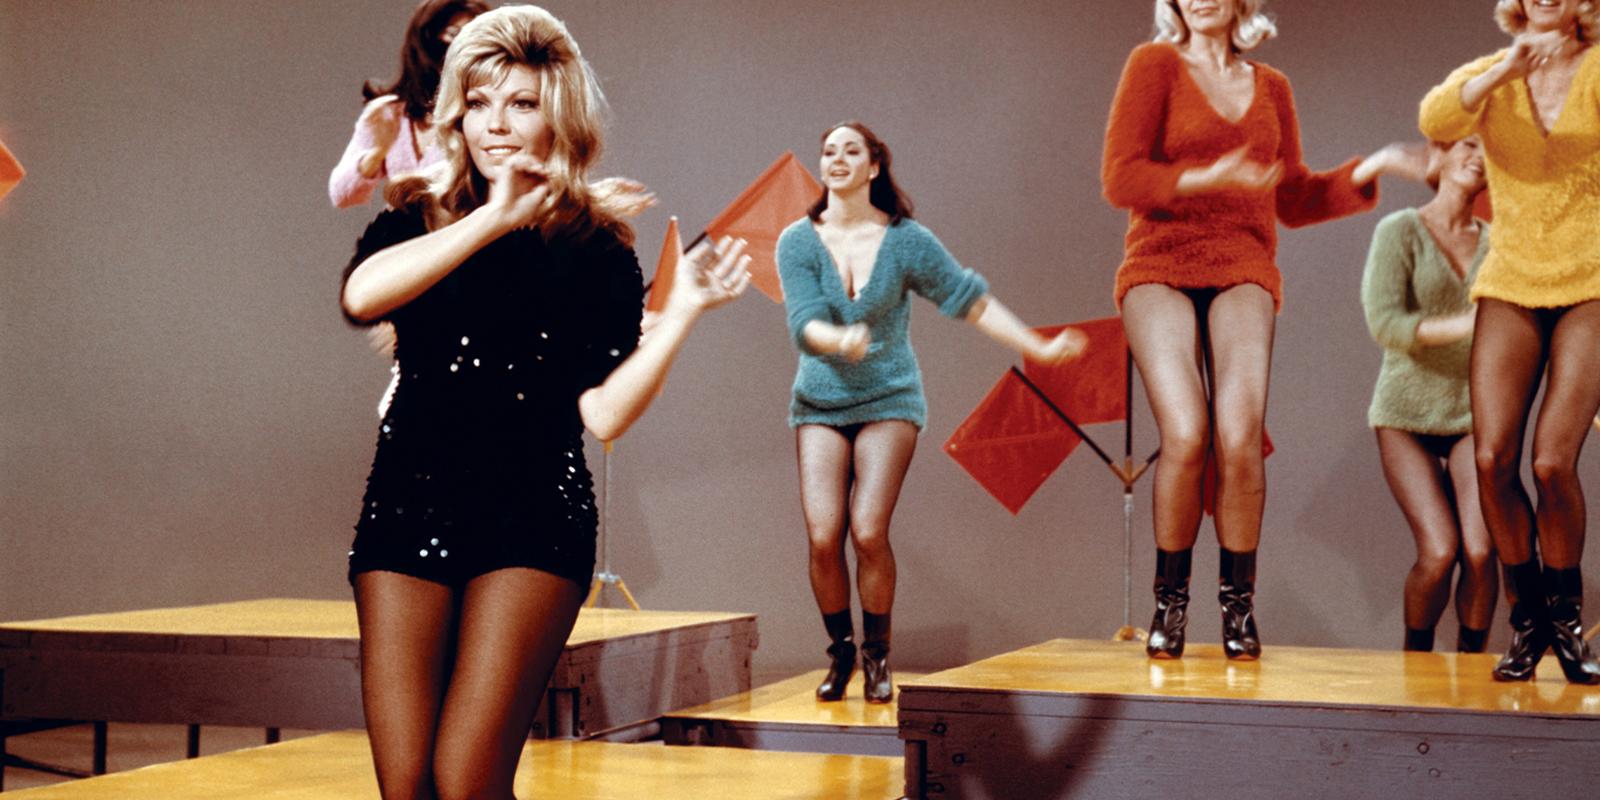 Nancy Sinatra's Boots LP reissued on vinyl